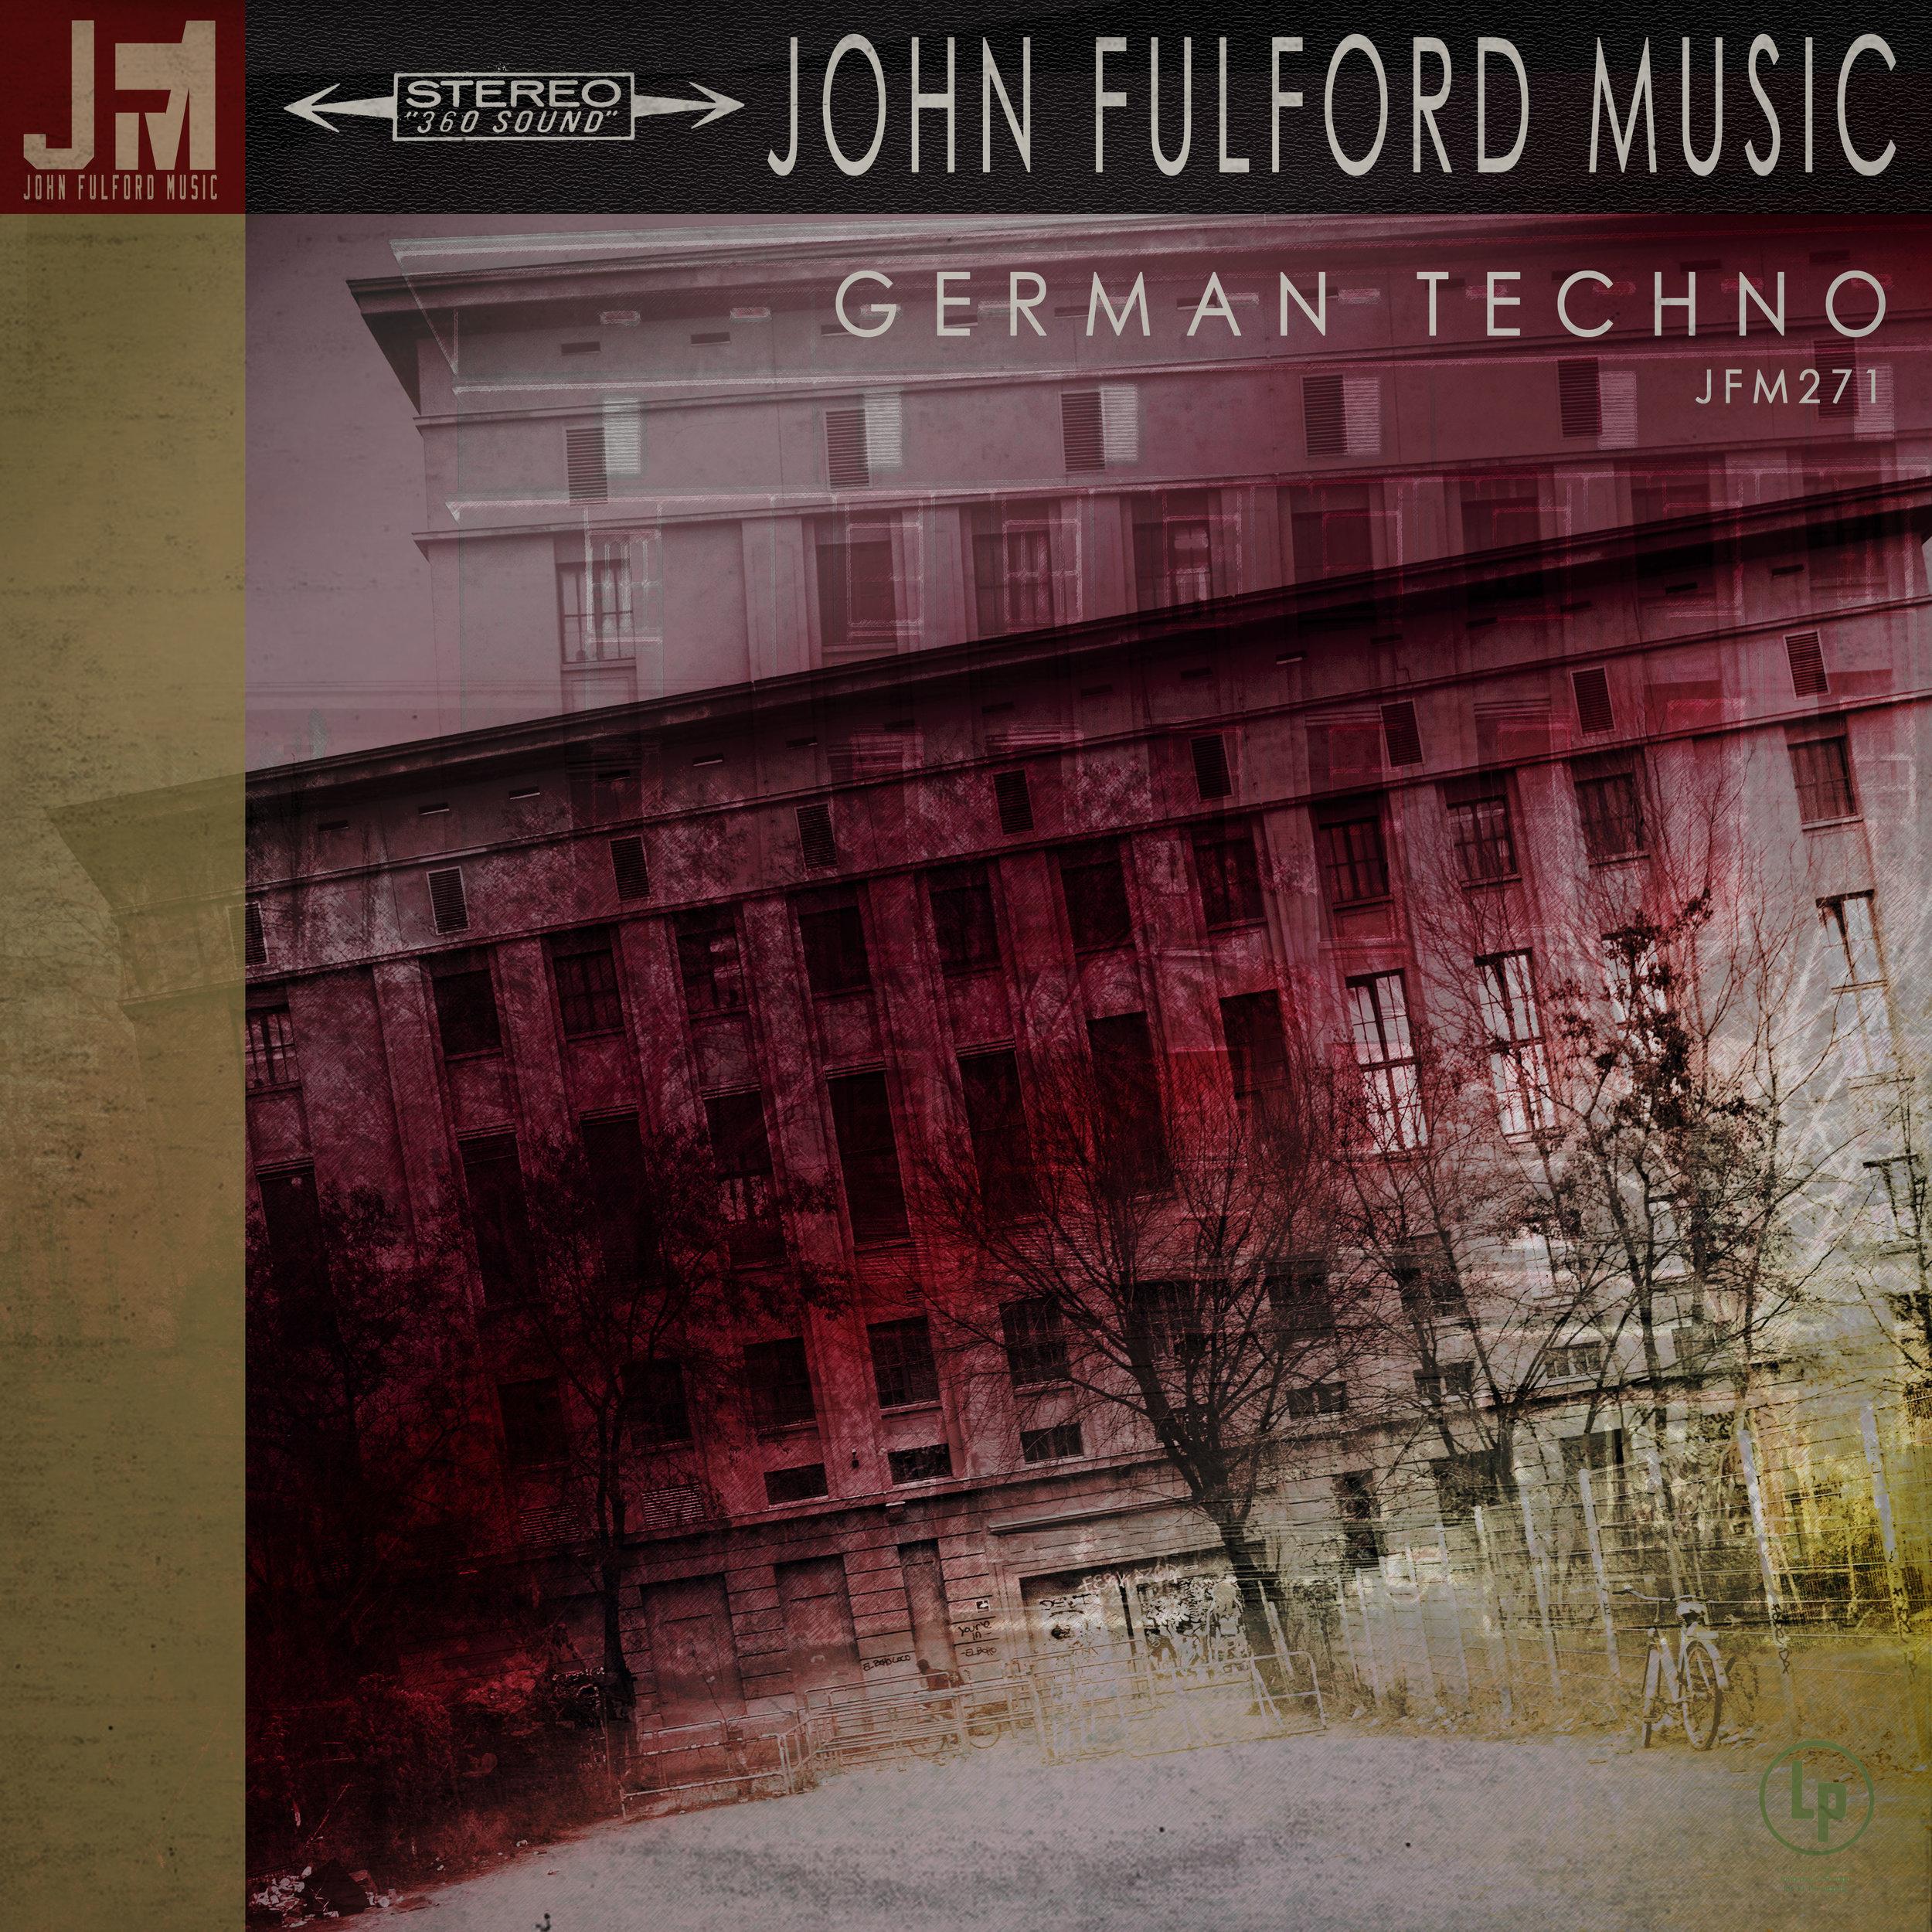 FULFORD-a-GERMAN-TECHNO-271-A.jpg